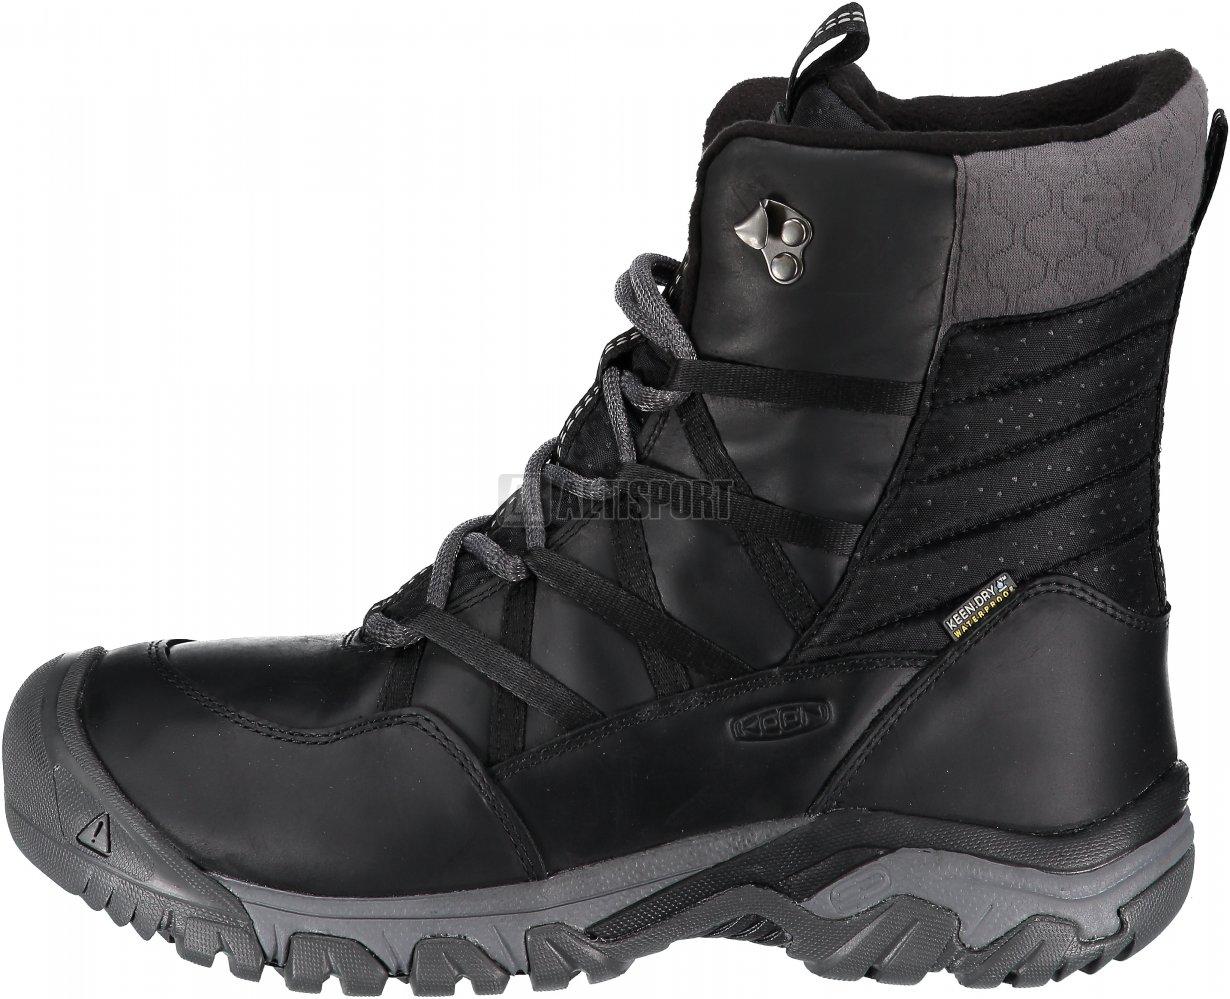 3e83b55c783 Dámské zimní boty KEEN HOODOO III LACE UP W BLACK MAGNET velikost ...